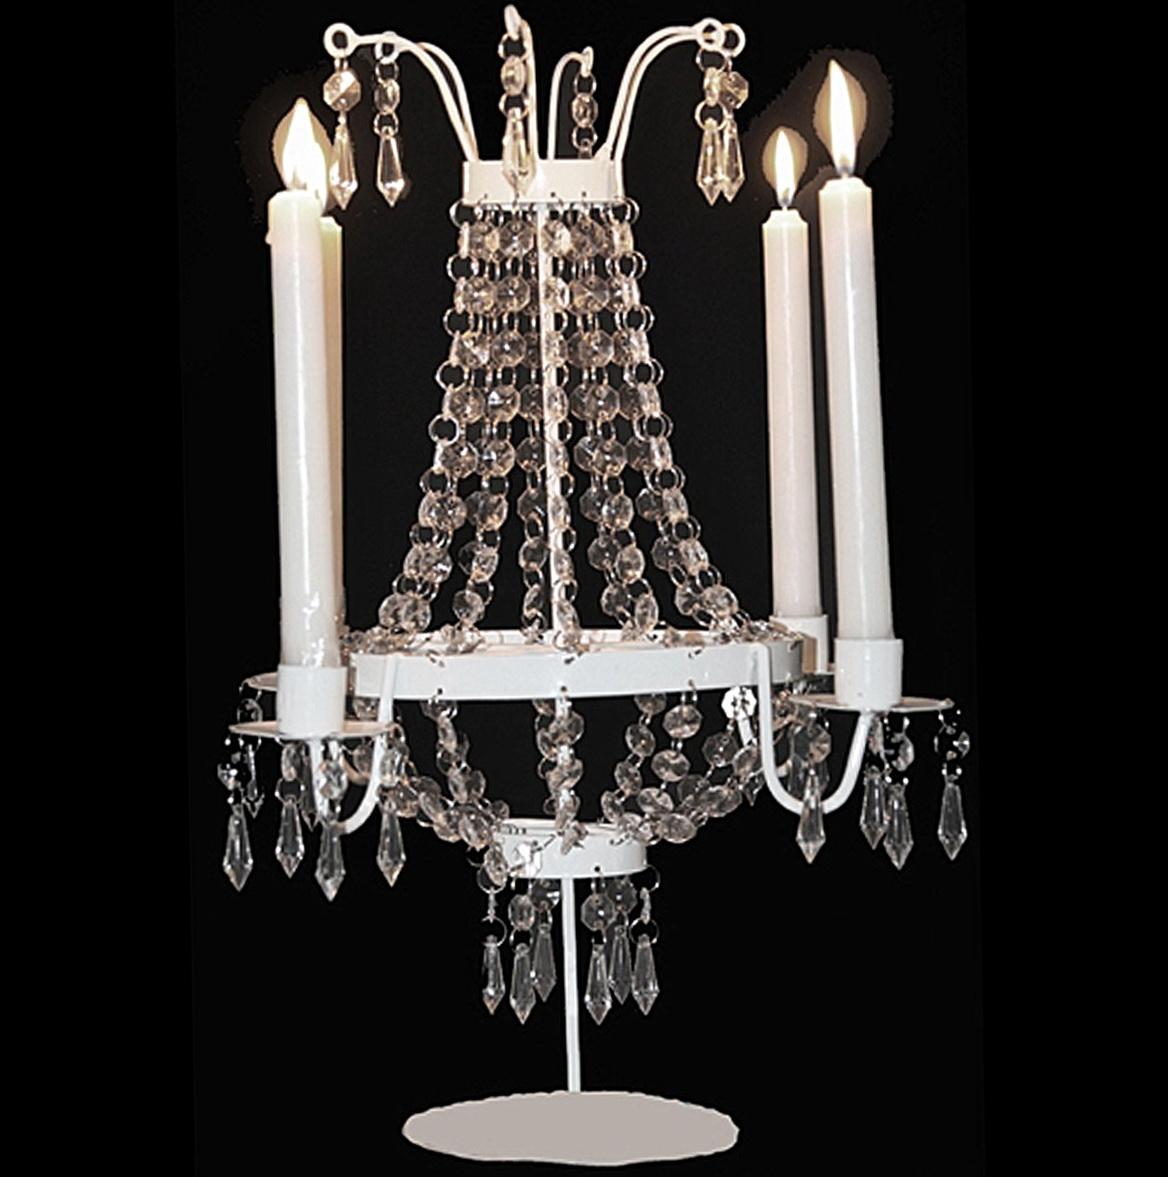 Chandelier candle holder centerpiece home design ideas